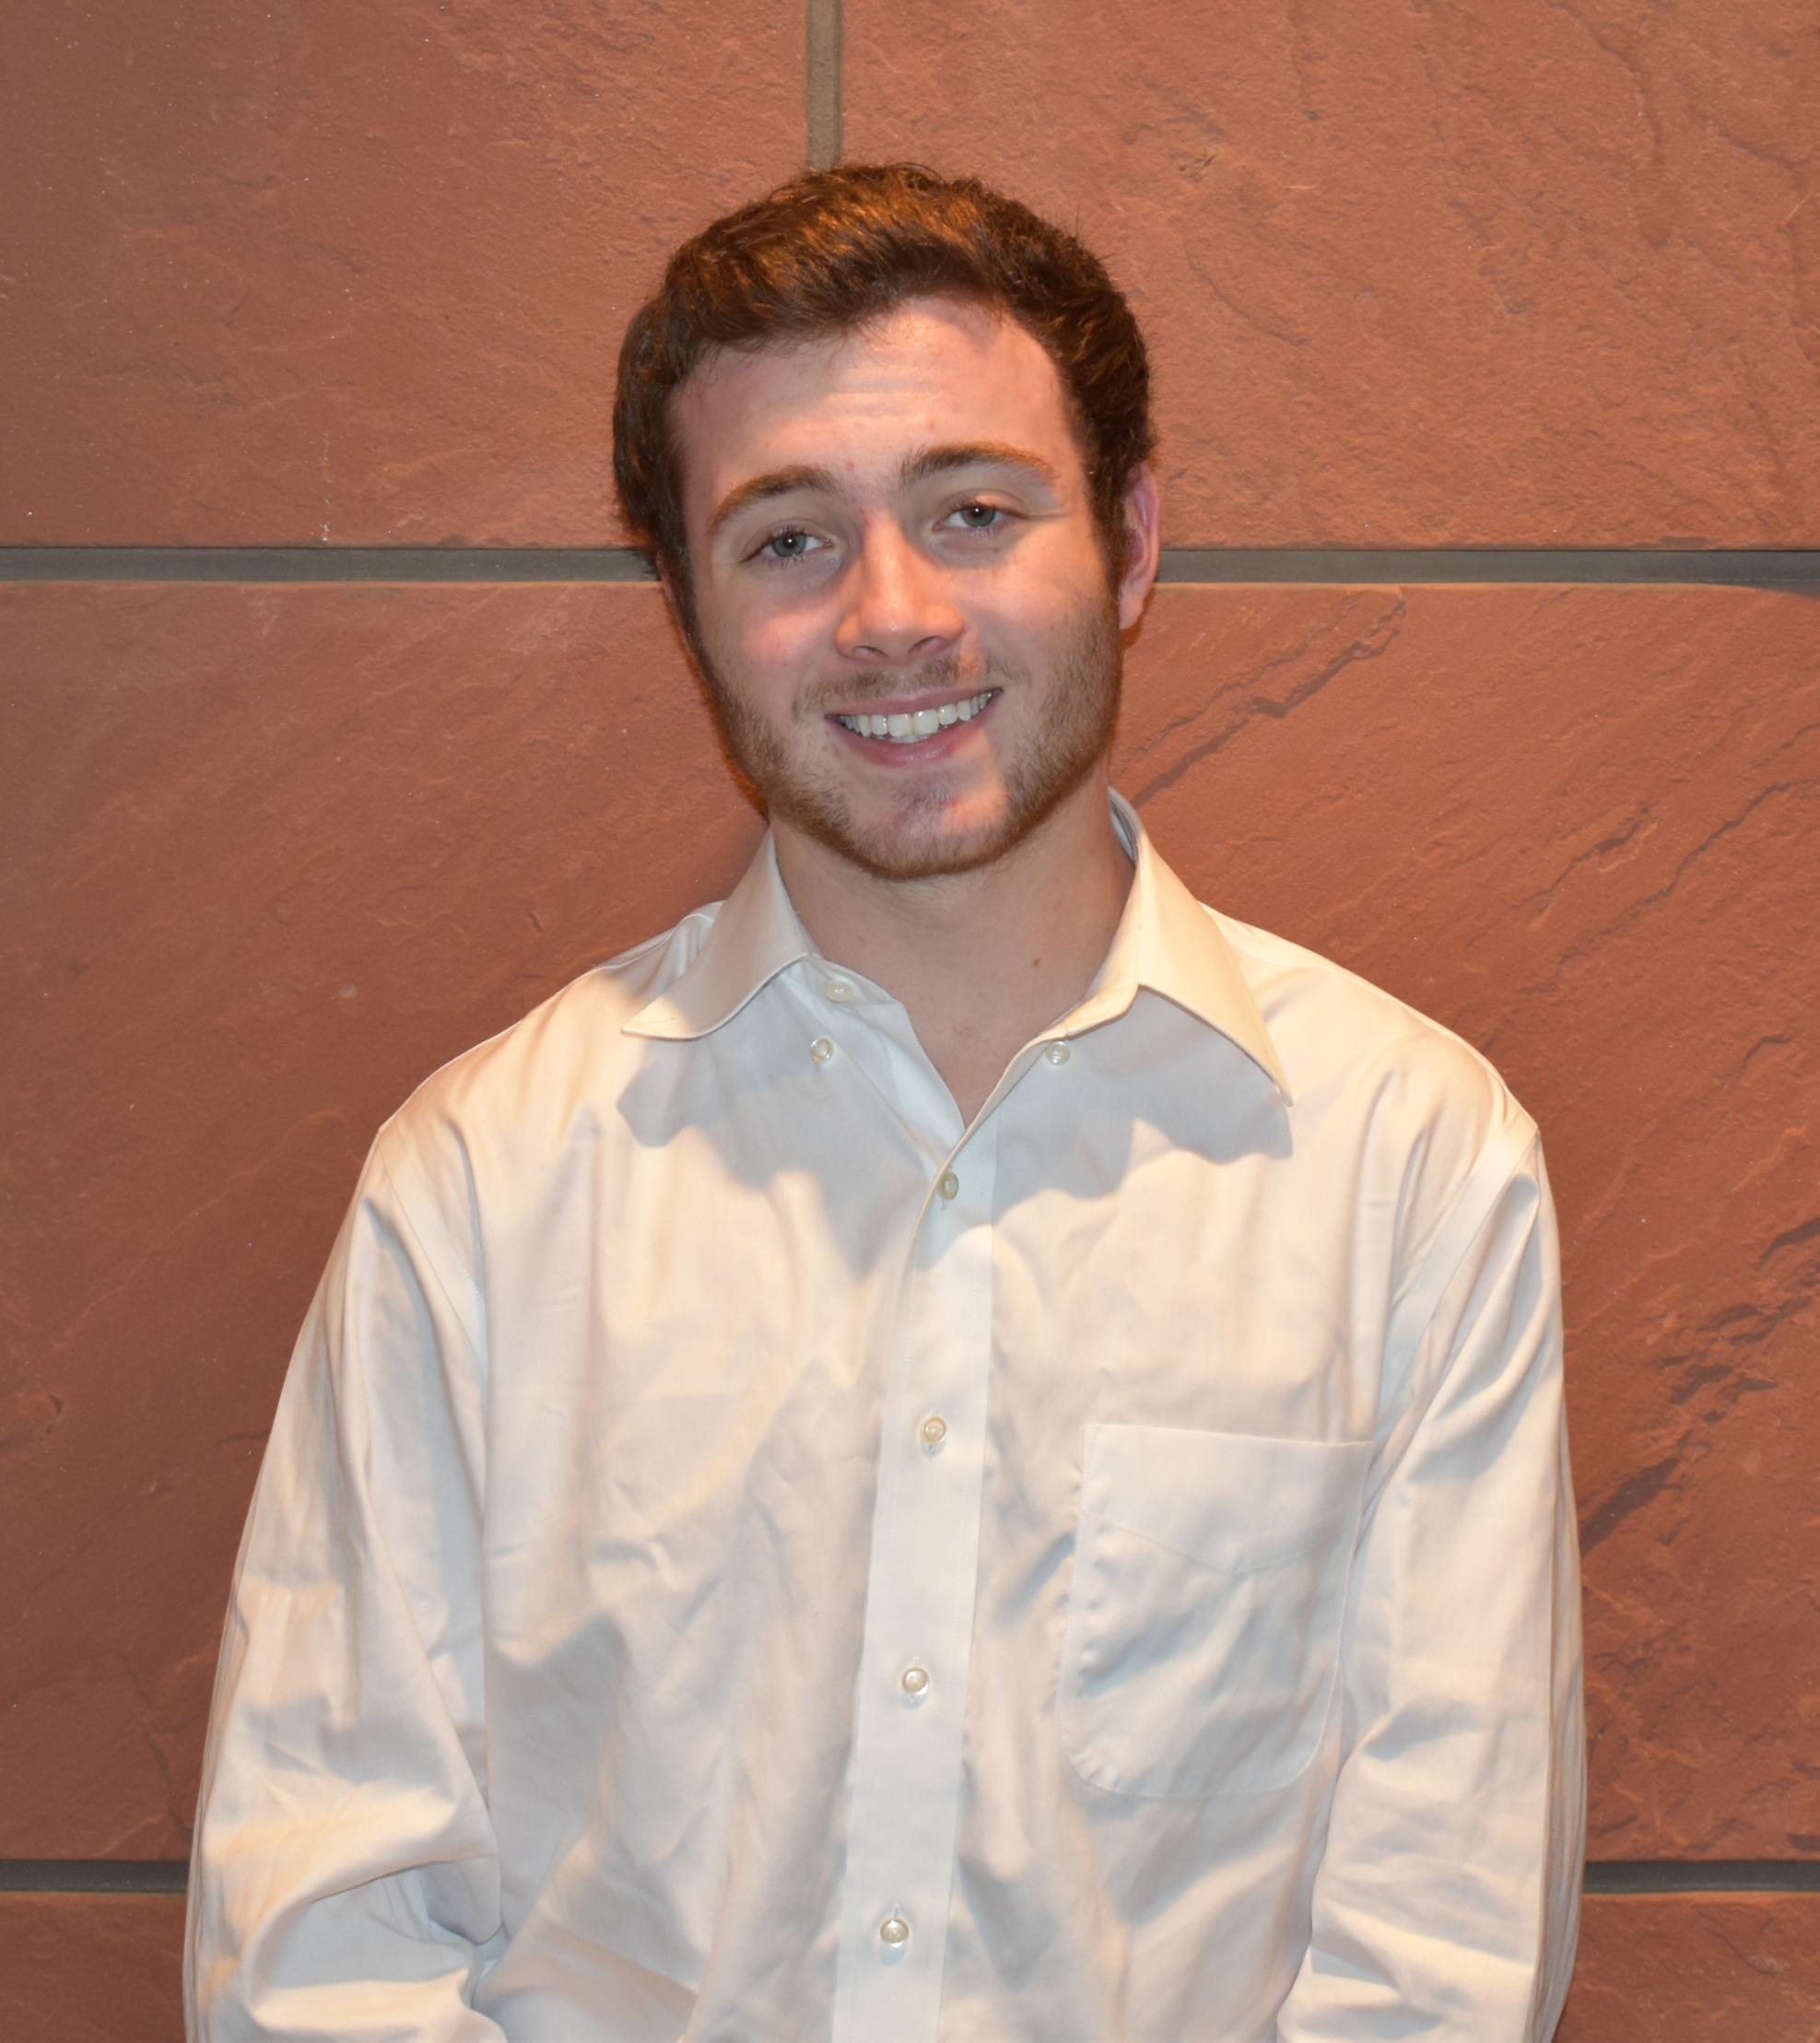 Tyler McGoldrick